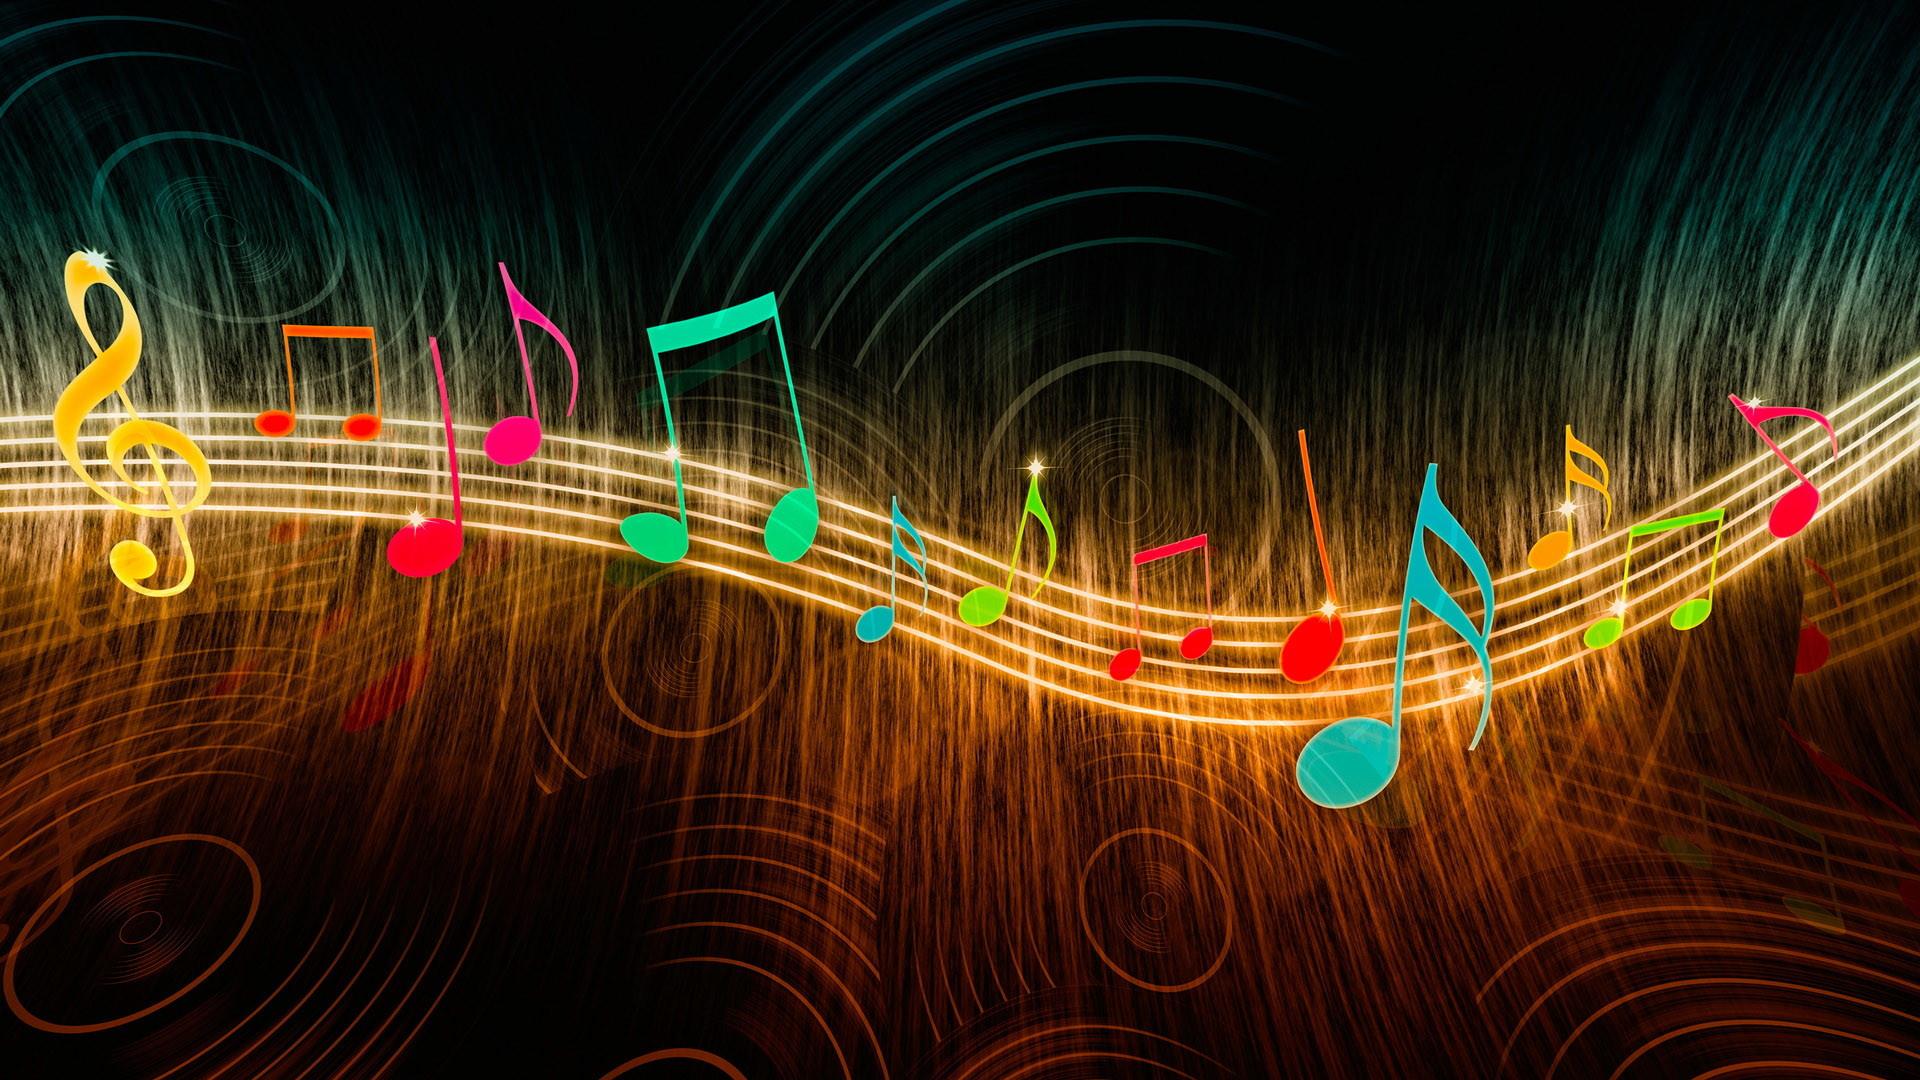 Free Download Music Backgrounds For Desktop.